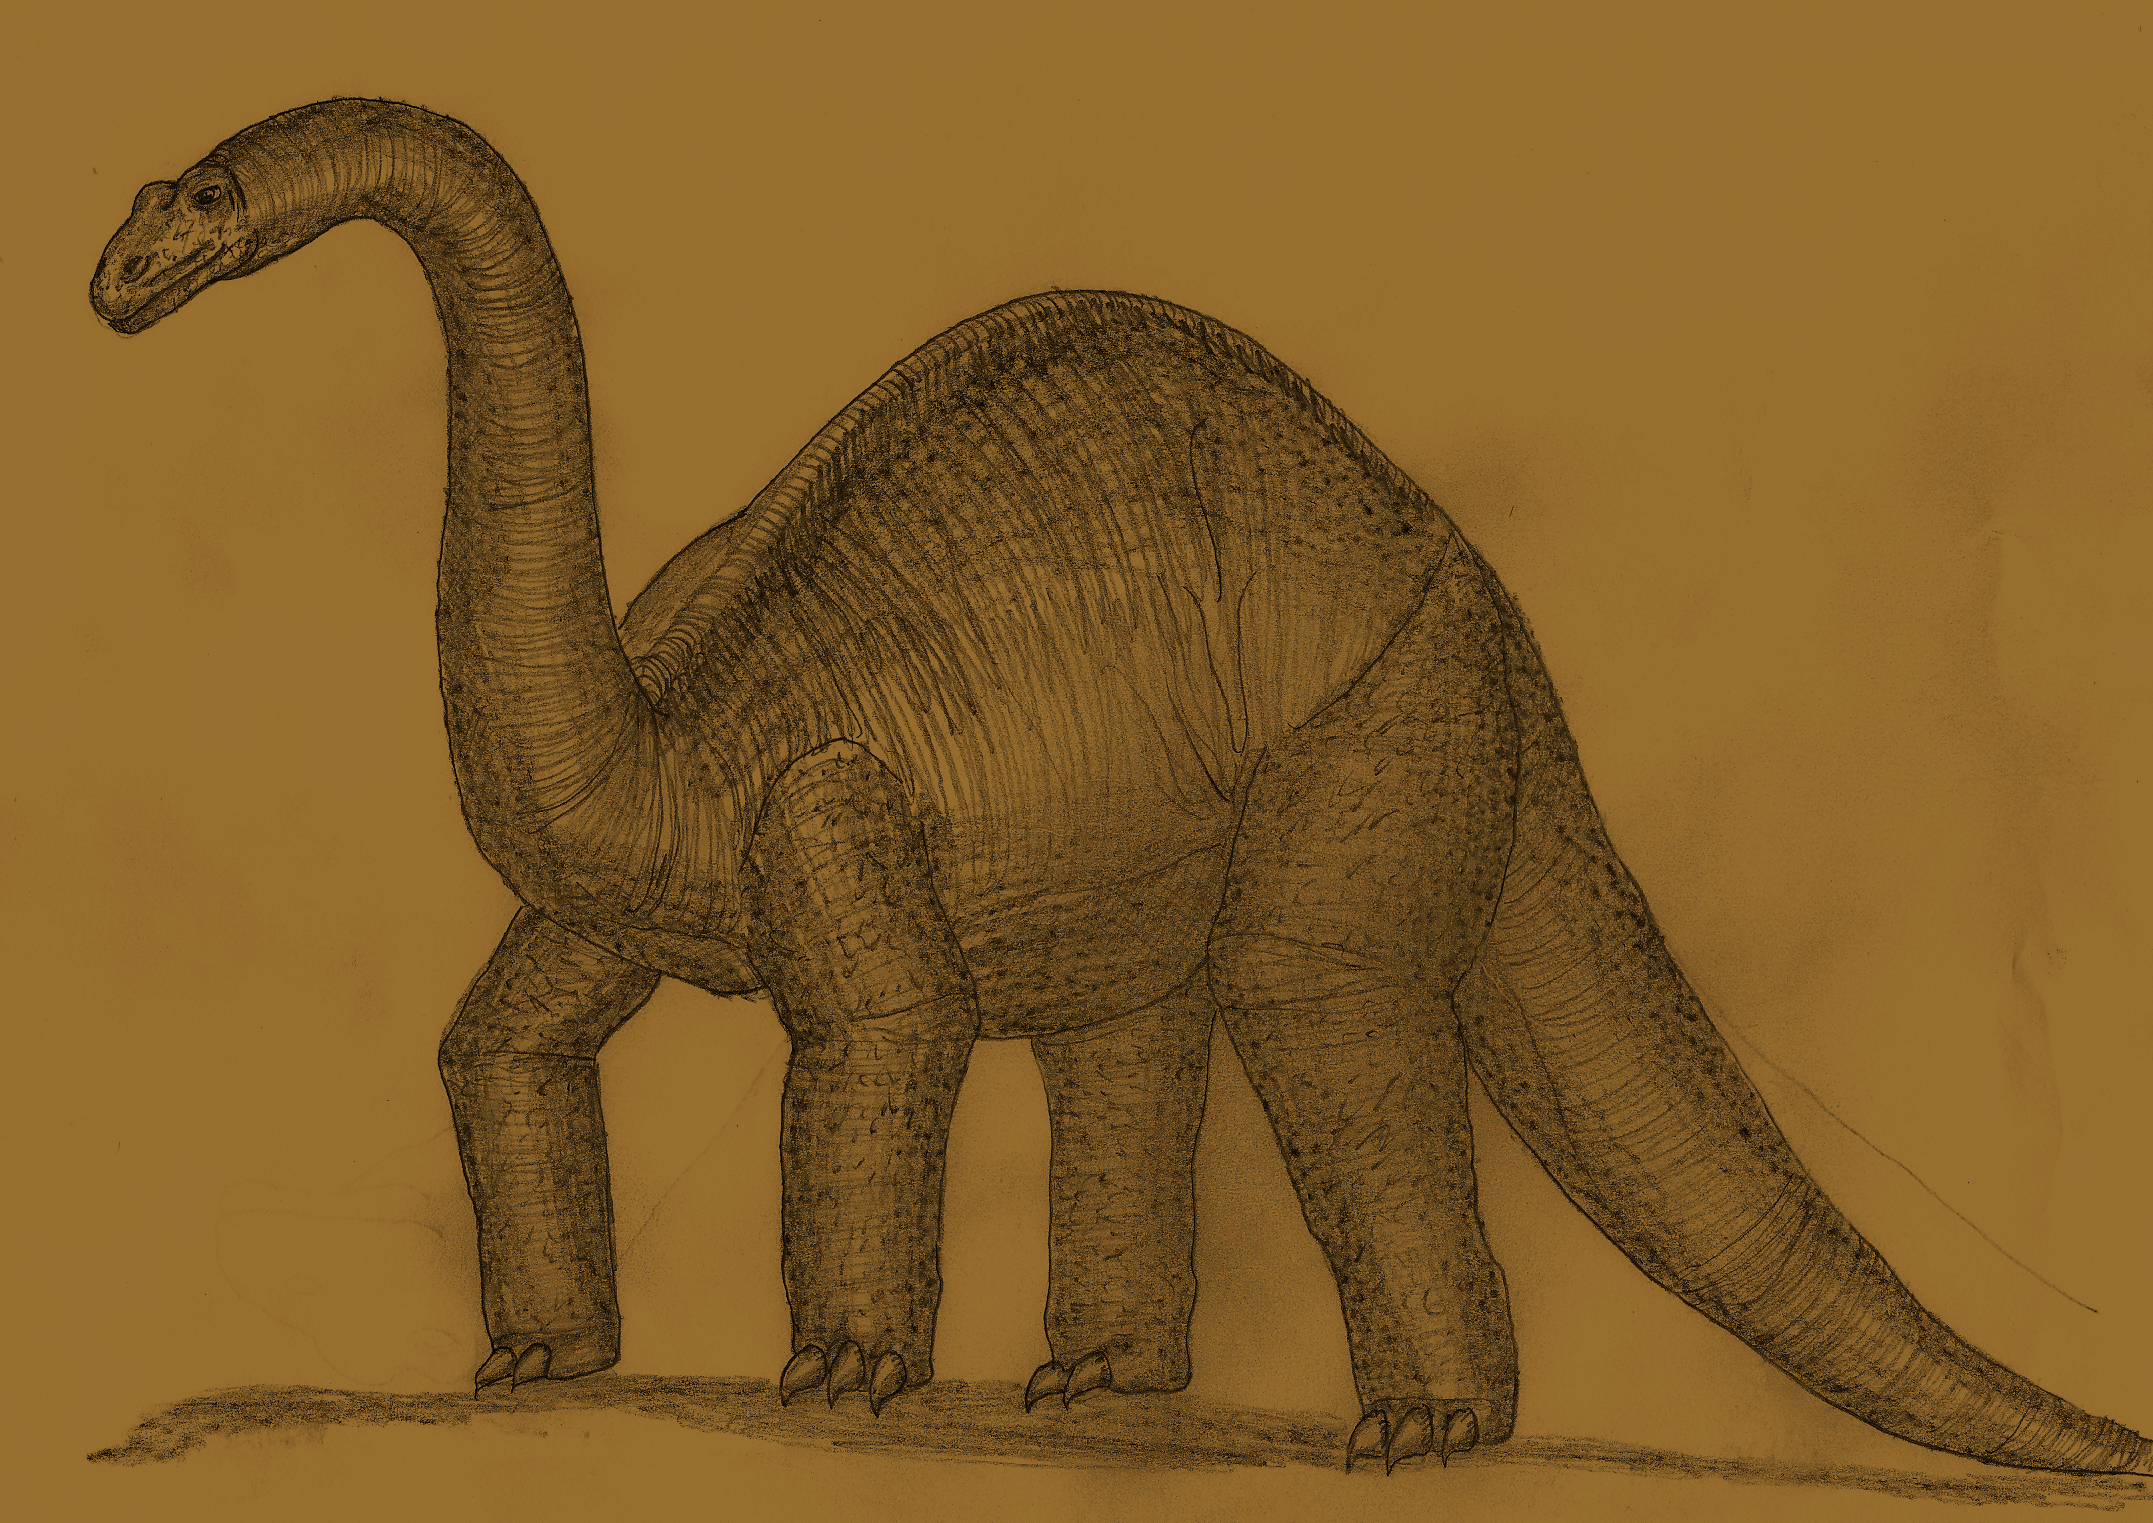 Brontosaurus summerleensis by Adiraiju on DeviantArt